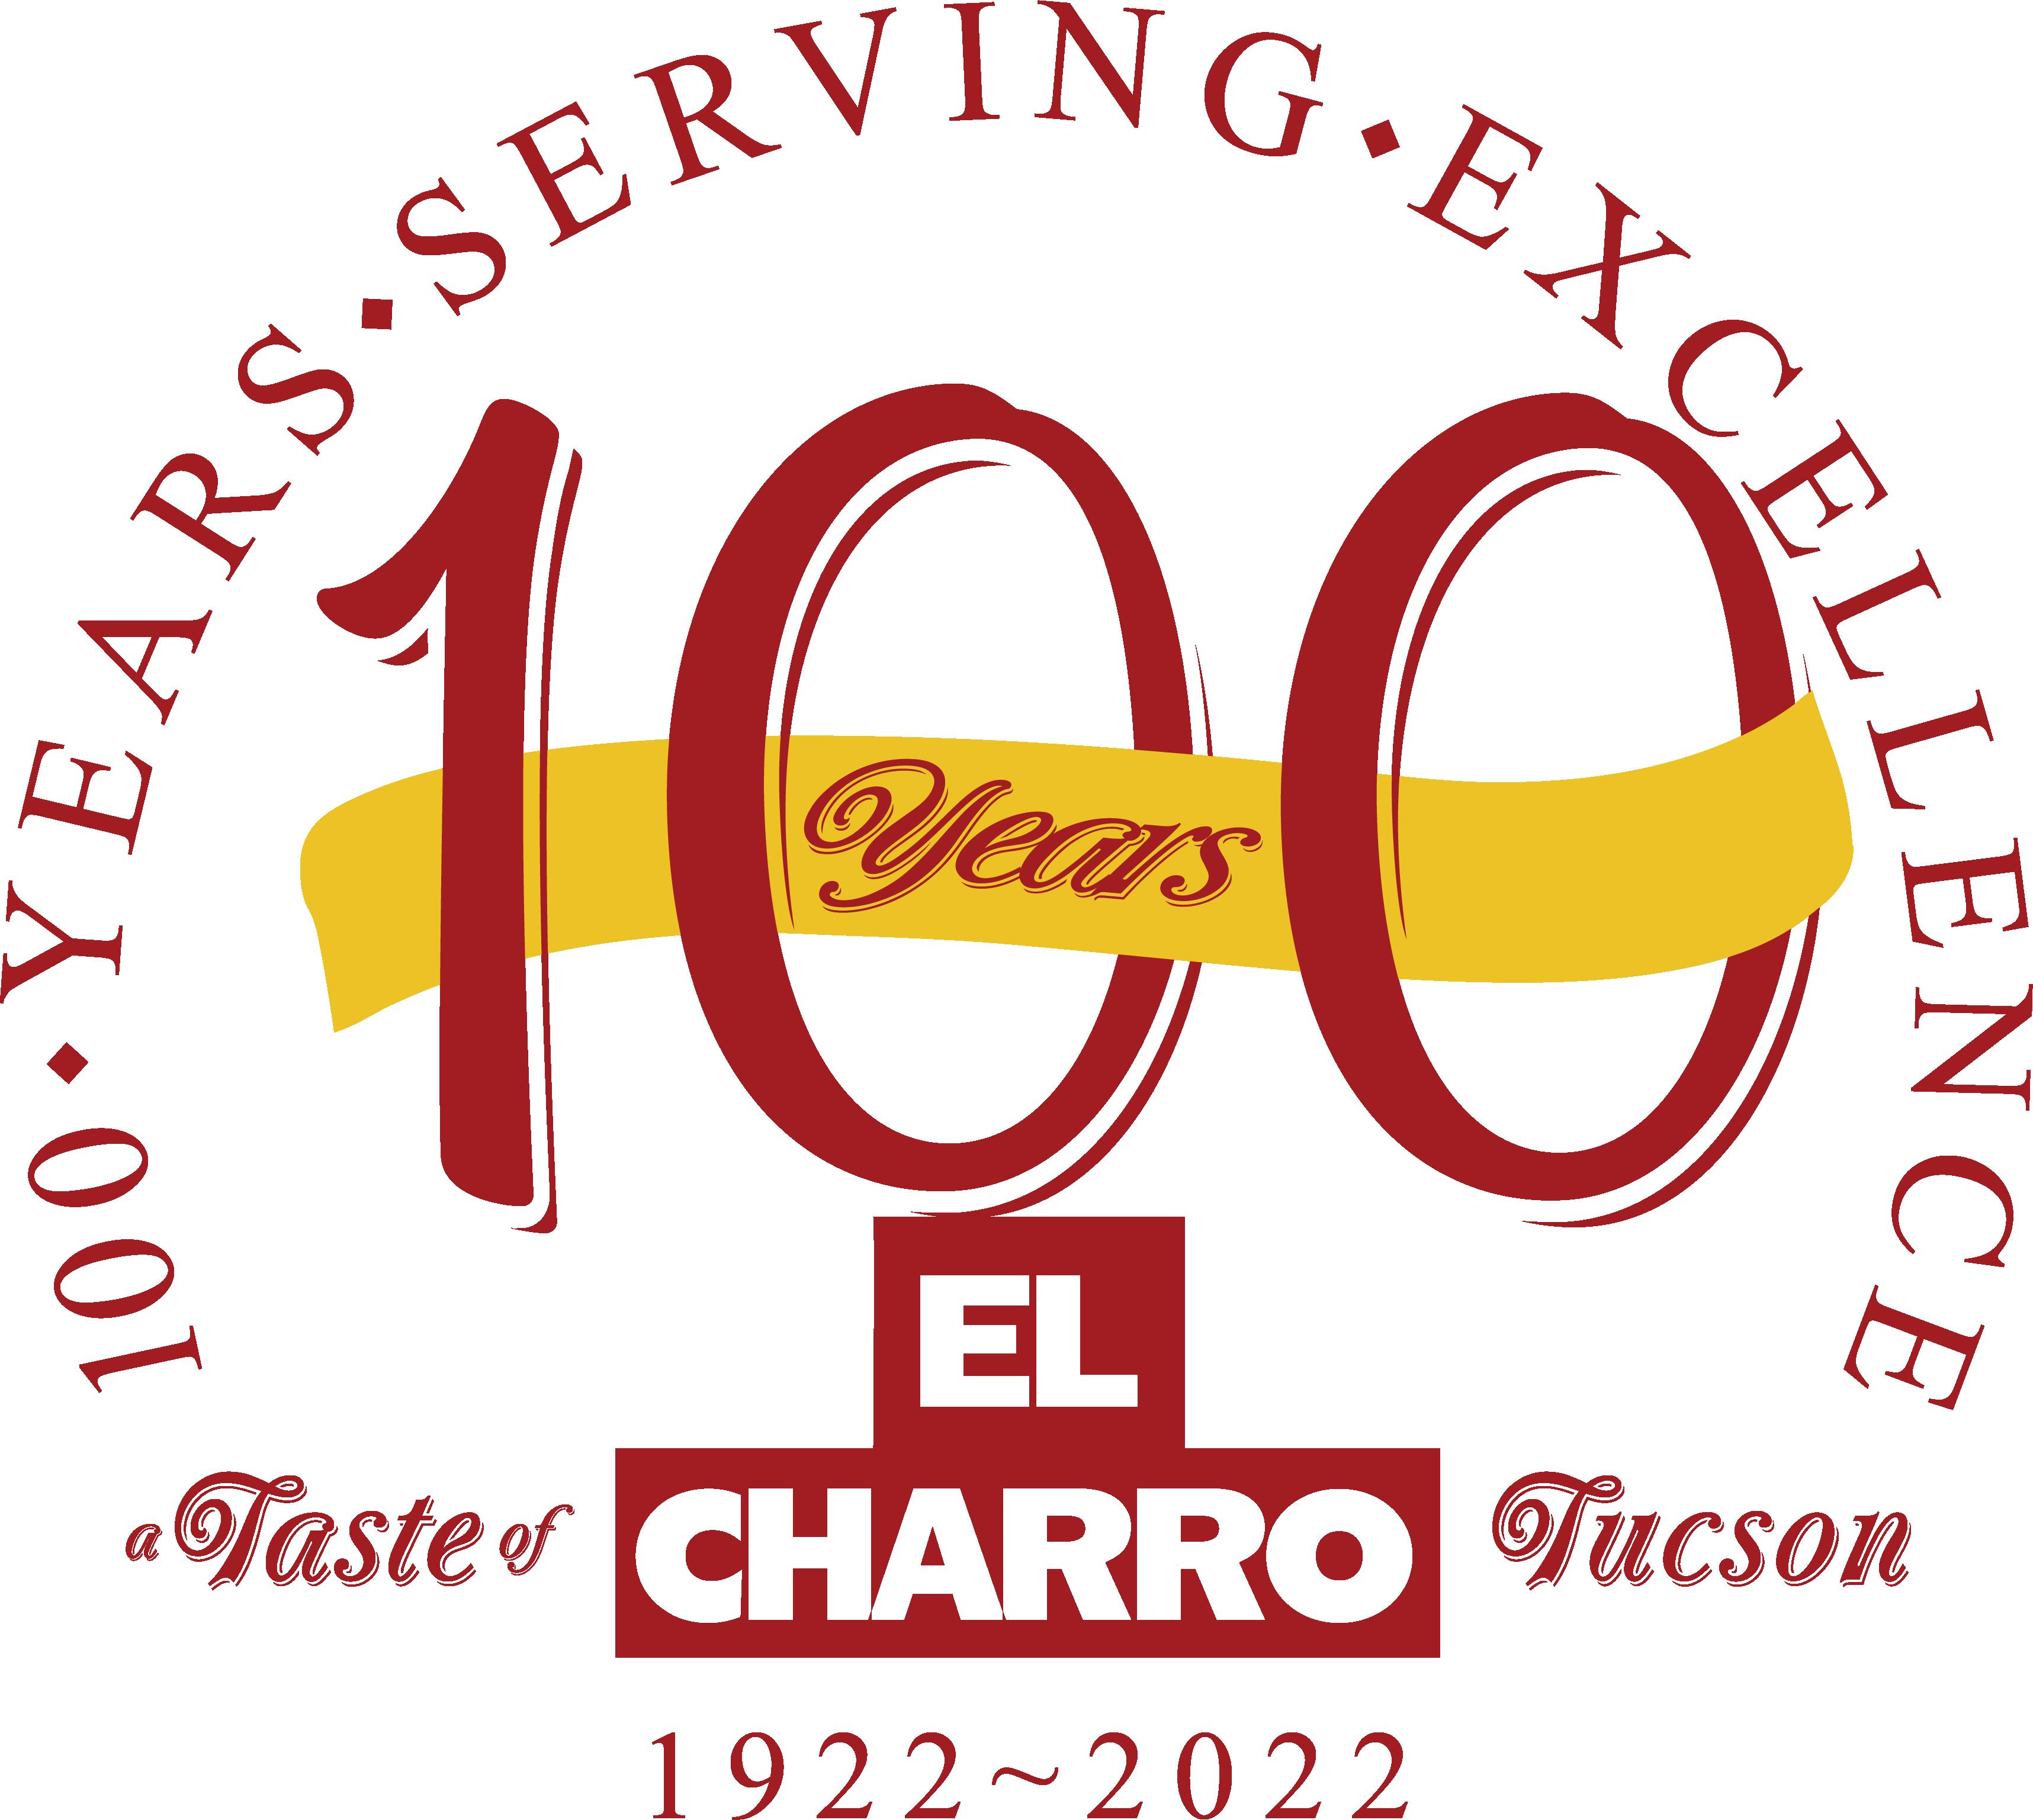 Charro 100